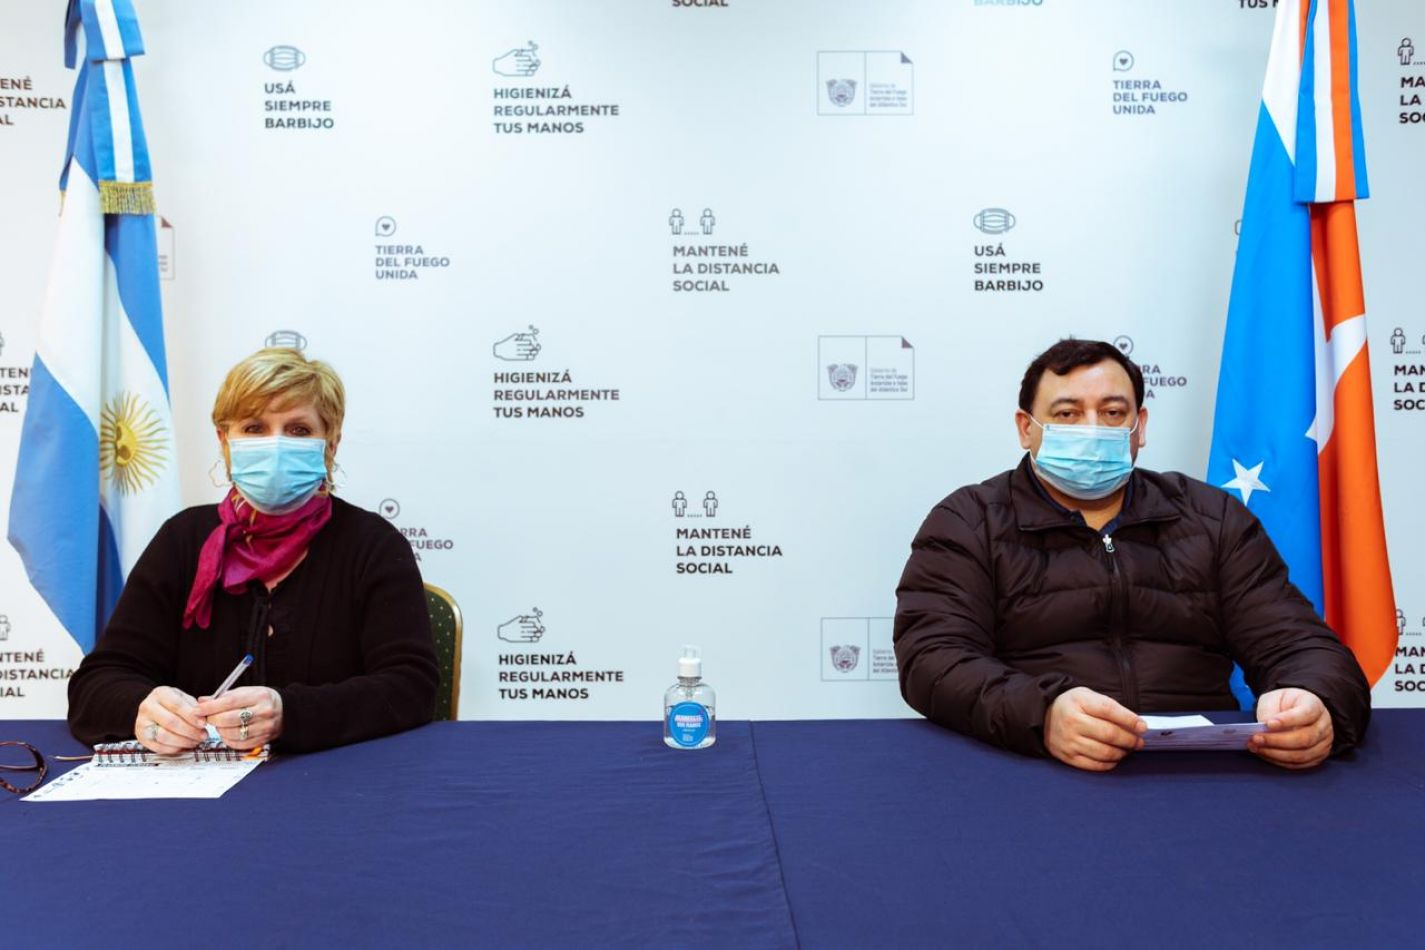 Parte diario epidemiológico Coronavirus COVID-19 al  31 de julio del 2020